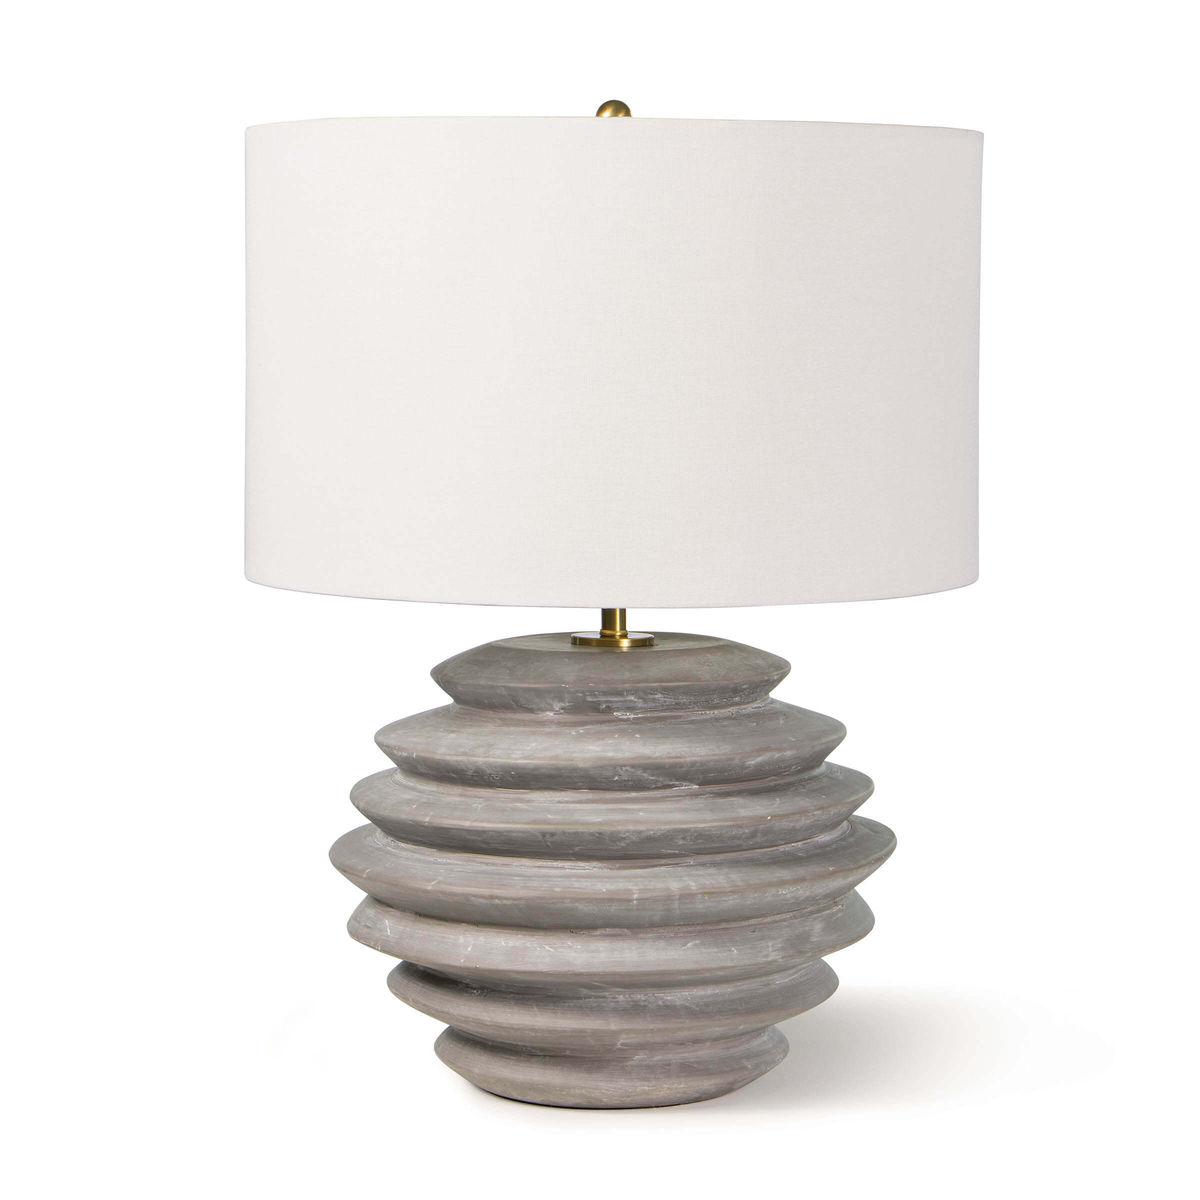 Canyon Ceramic Table Lamp